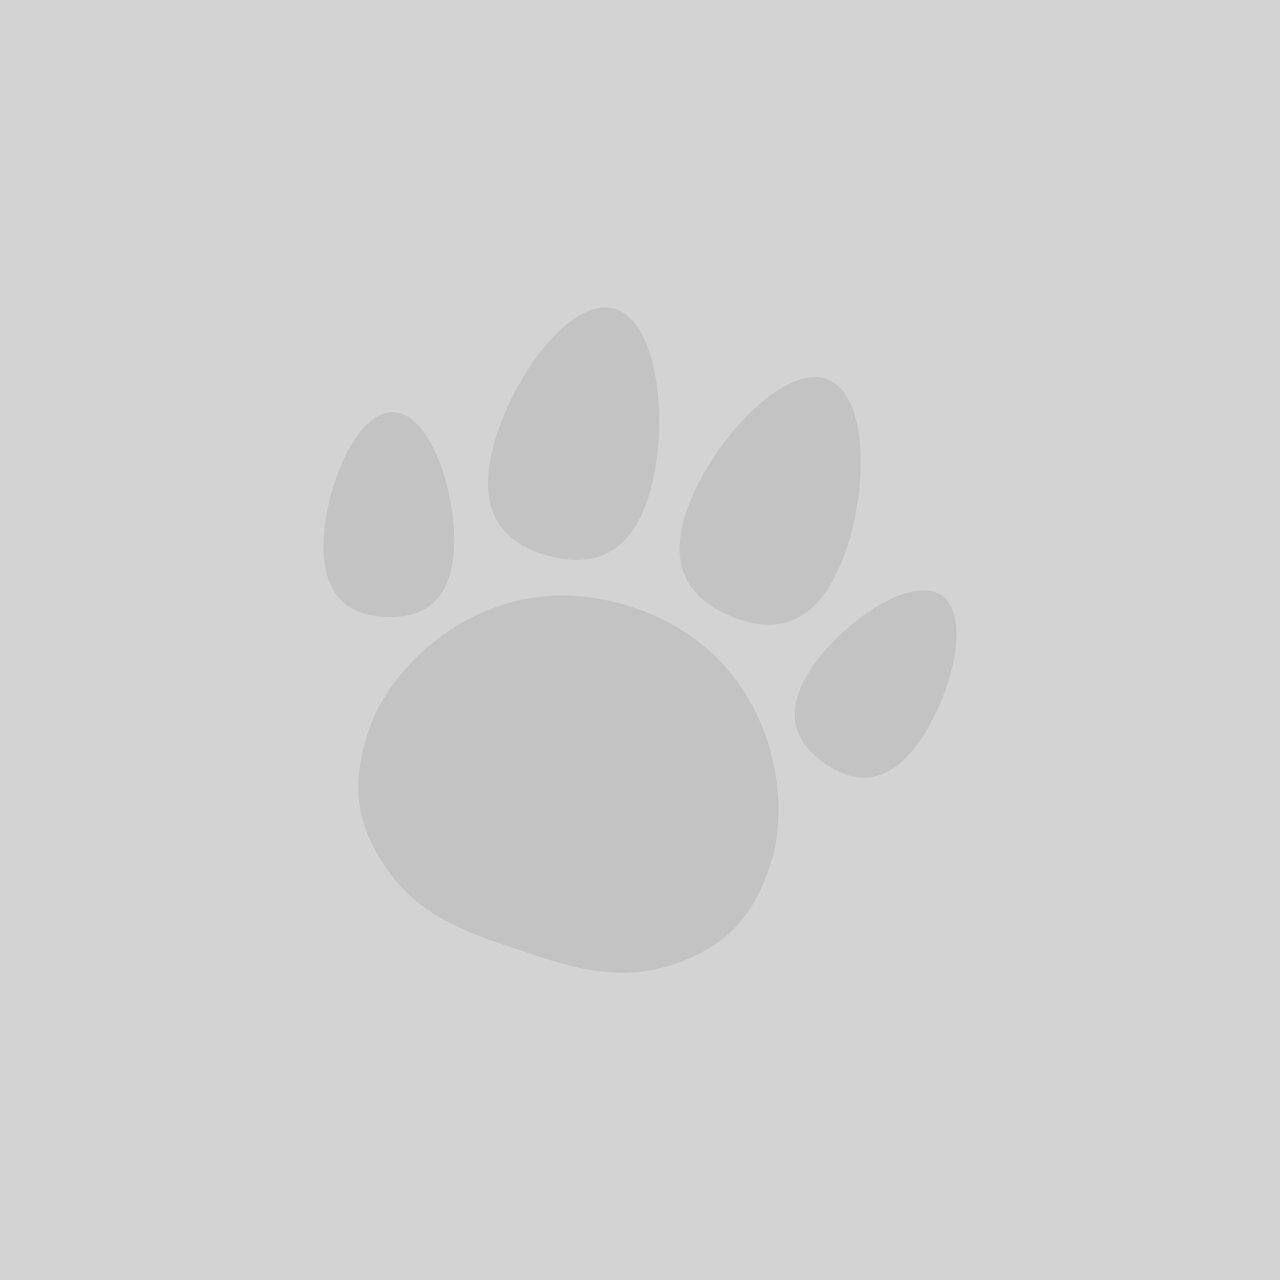 Doodlebone Rambler 5 Meter Retractable Dog Lead Blue